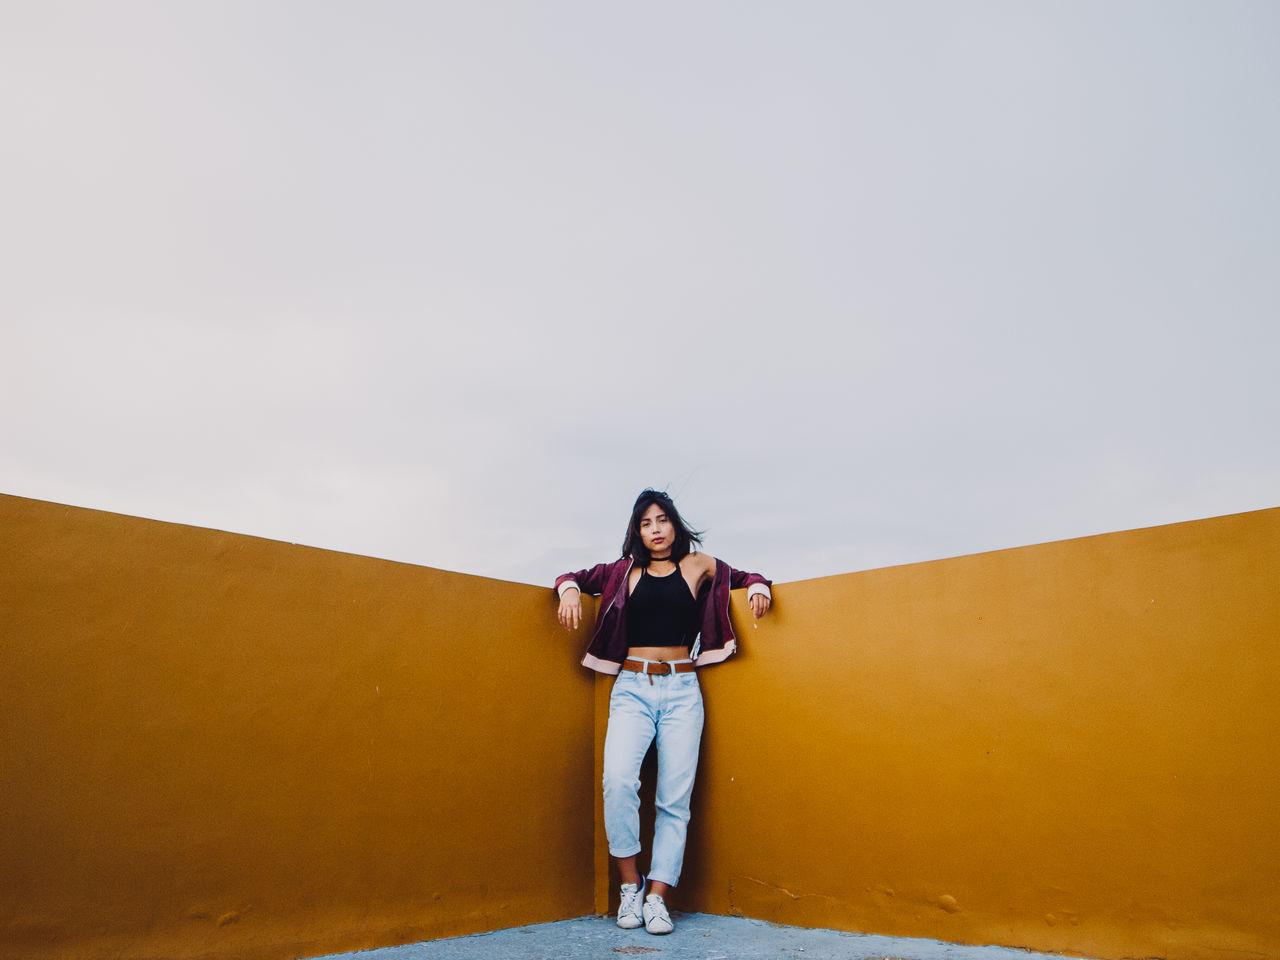 art Asian Eyeem Philippines Fashion female girl outdoors pastel portrait ricoh Ricoh GRD III The Week On EyeEm Woman